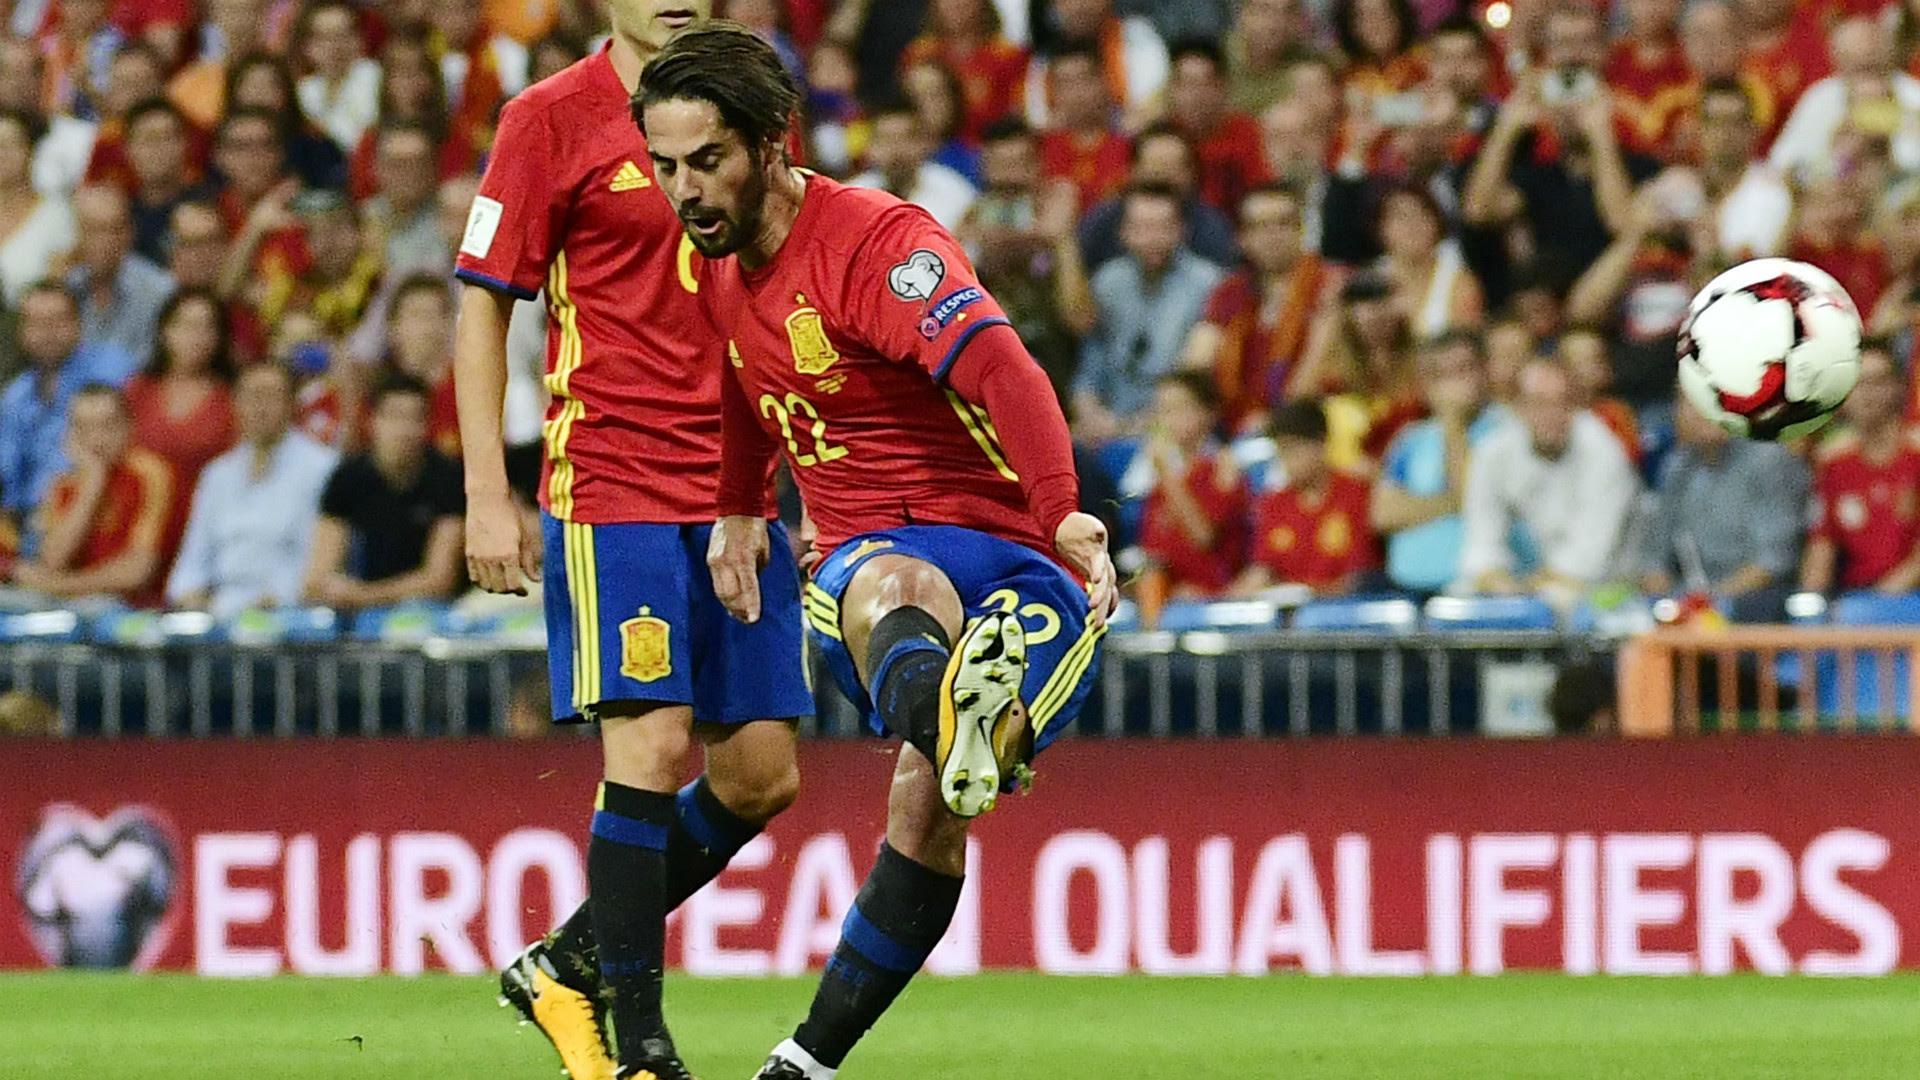 Spain National Team Wallpaper 2018 (71+ images)